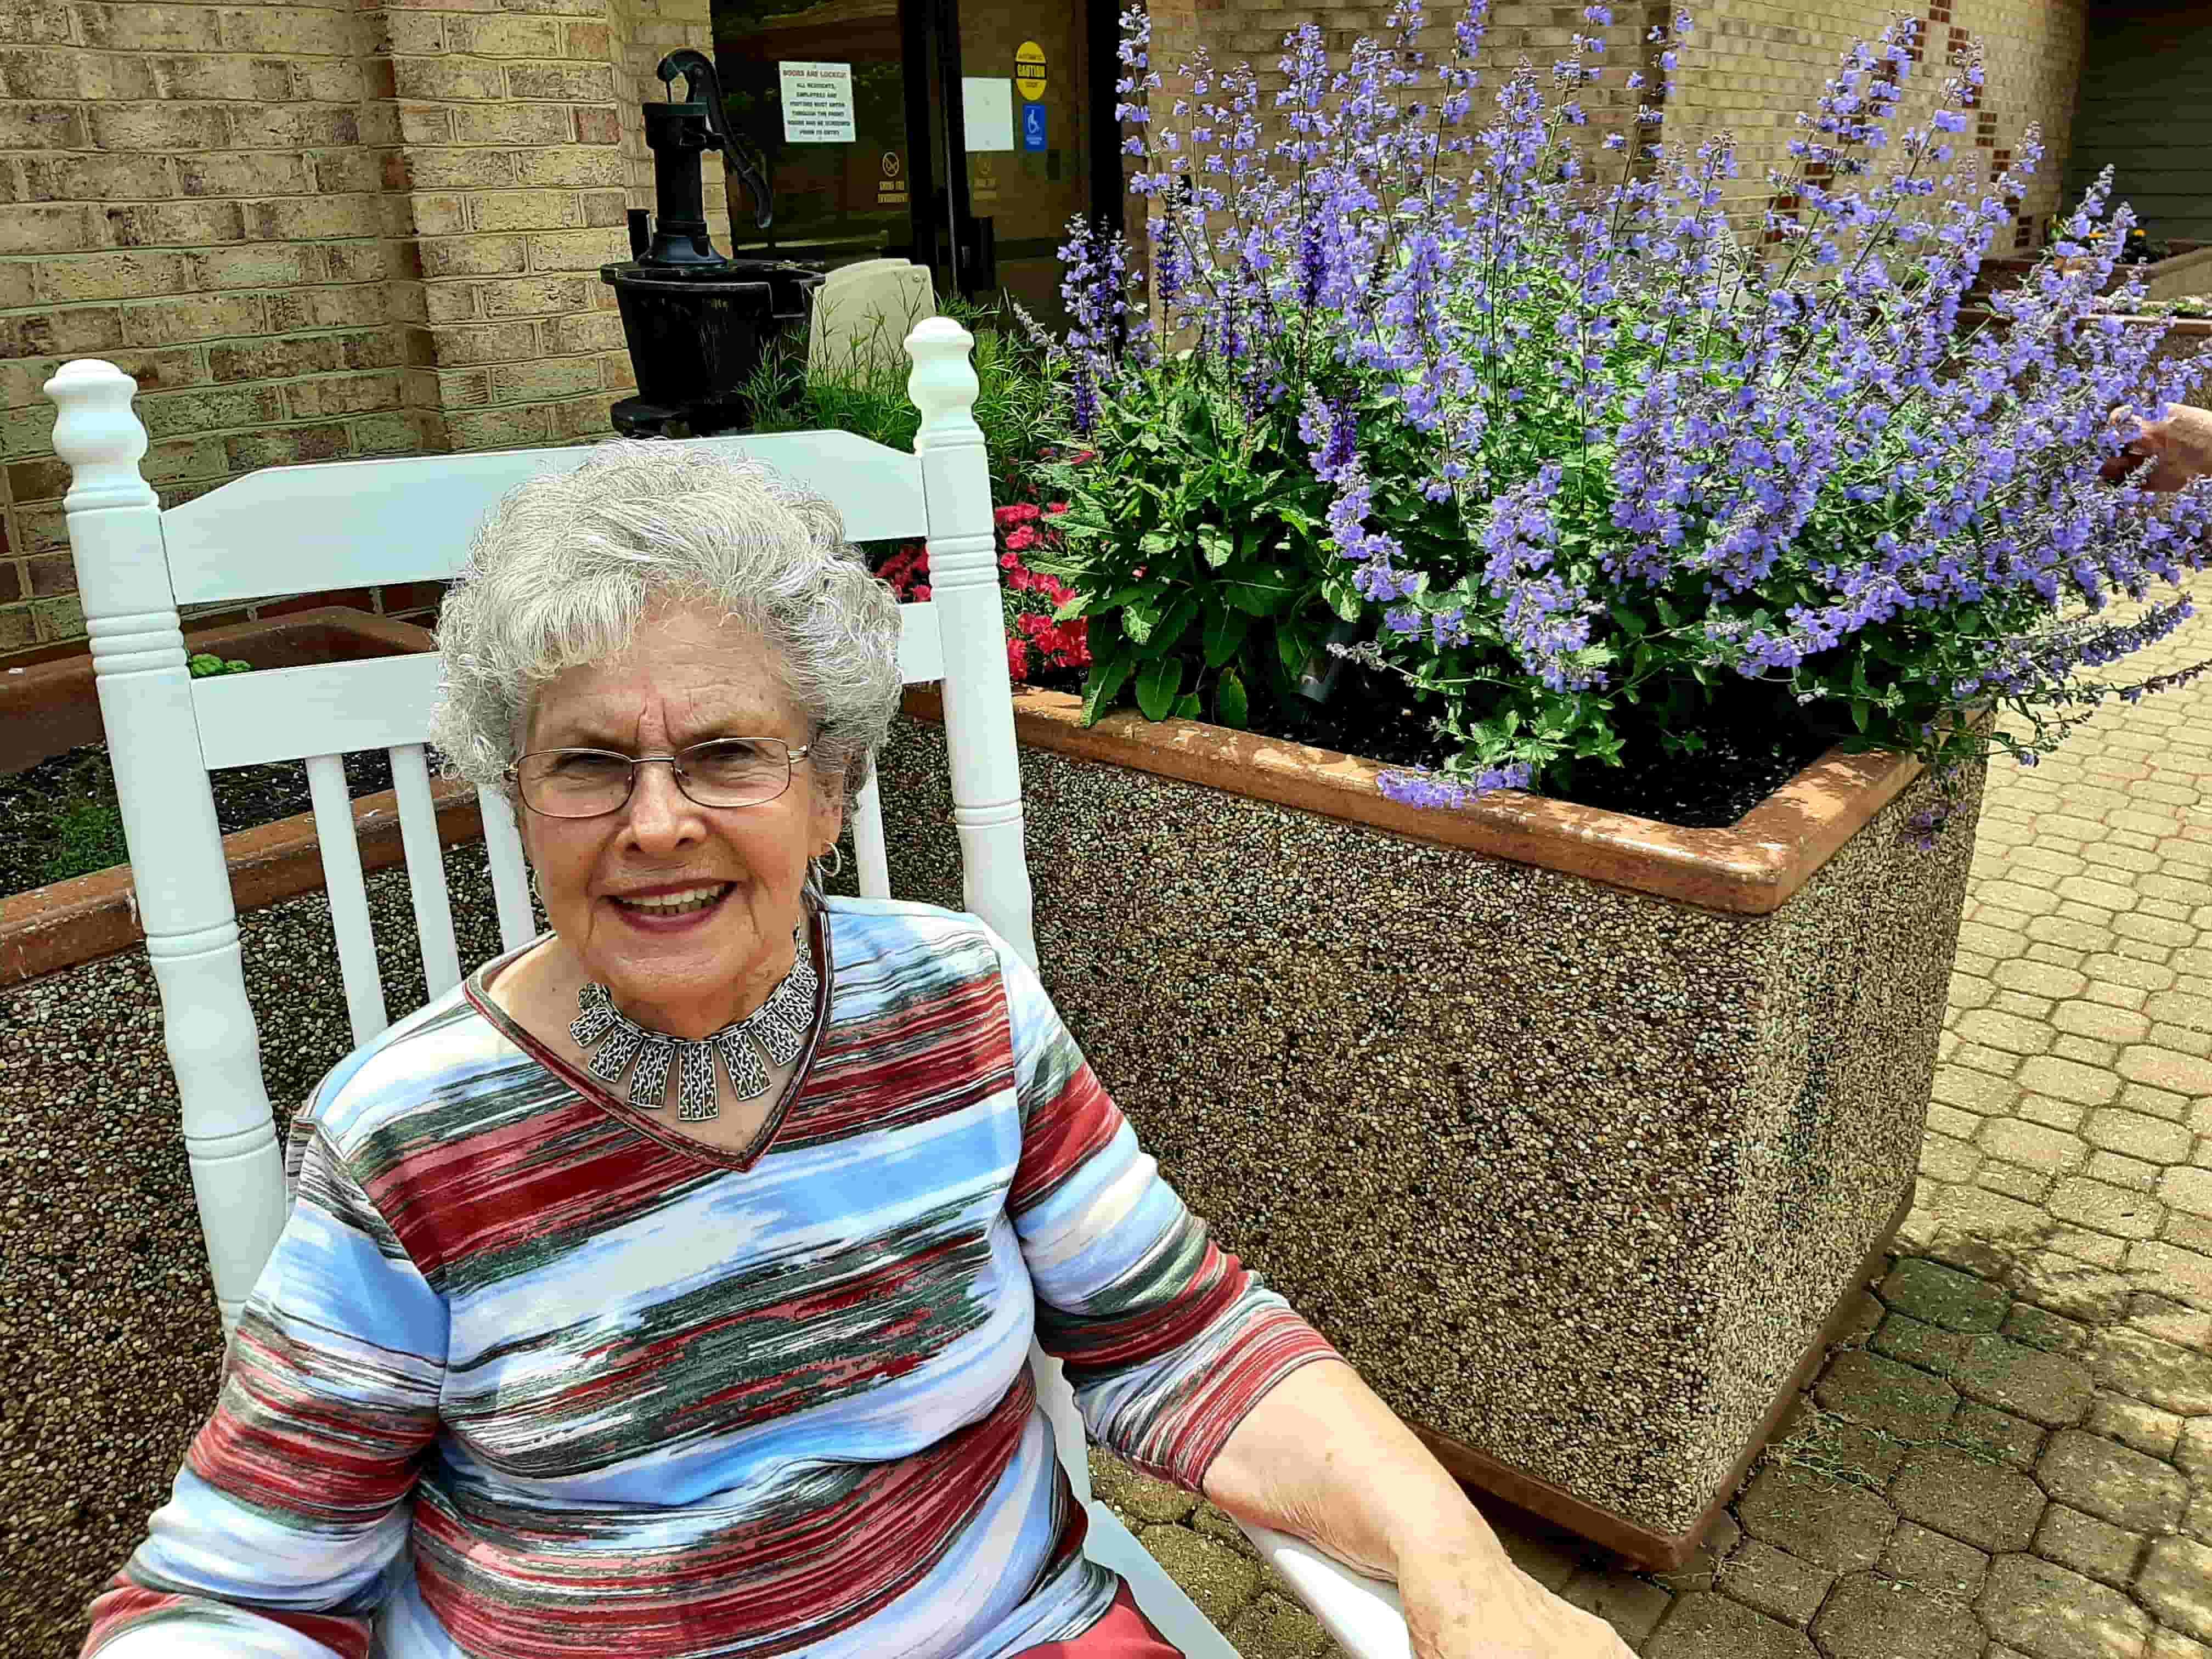 Female senior outside in rocking chair, Friendship resident Ginny Coleman